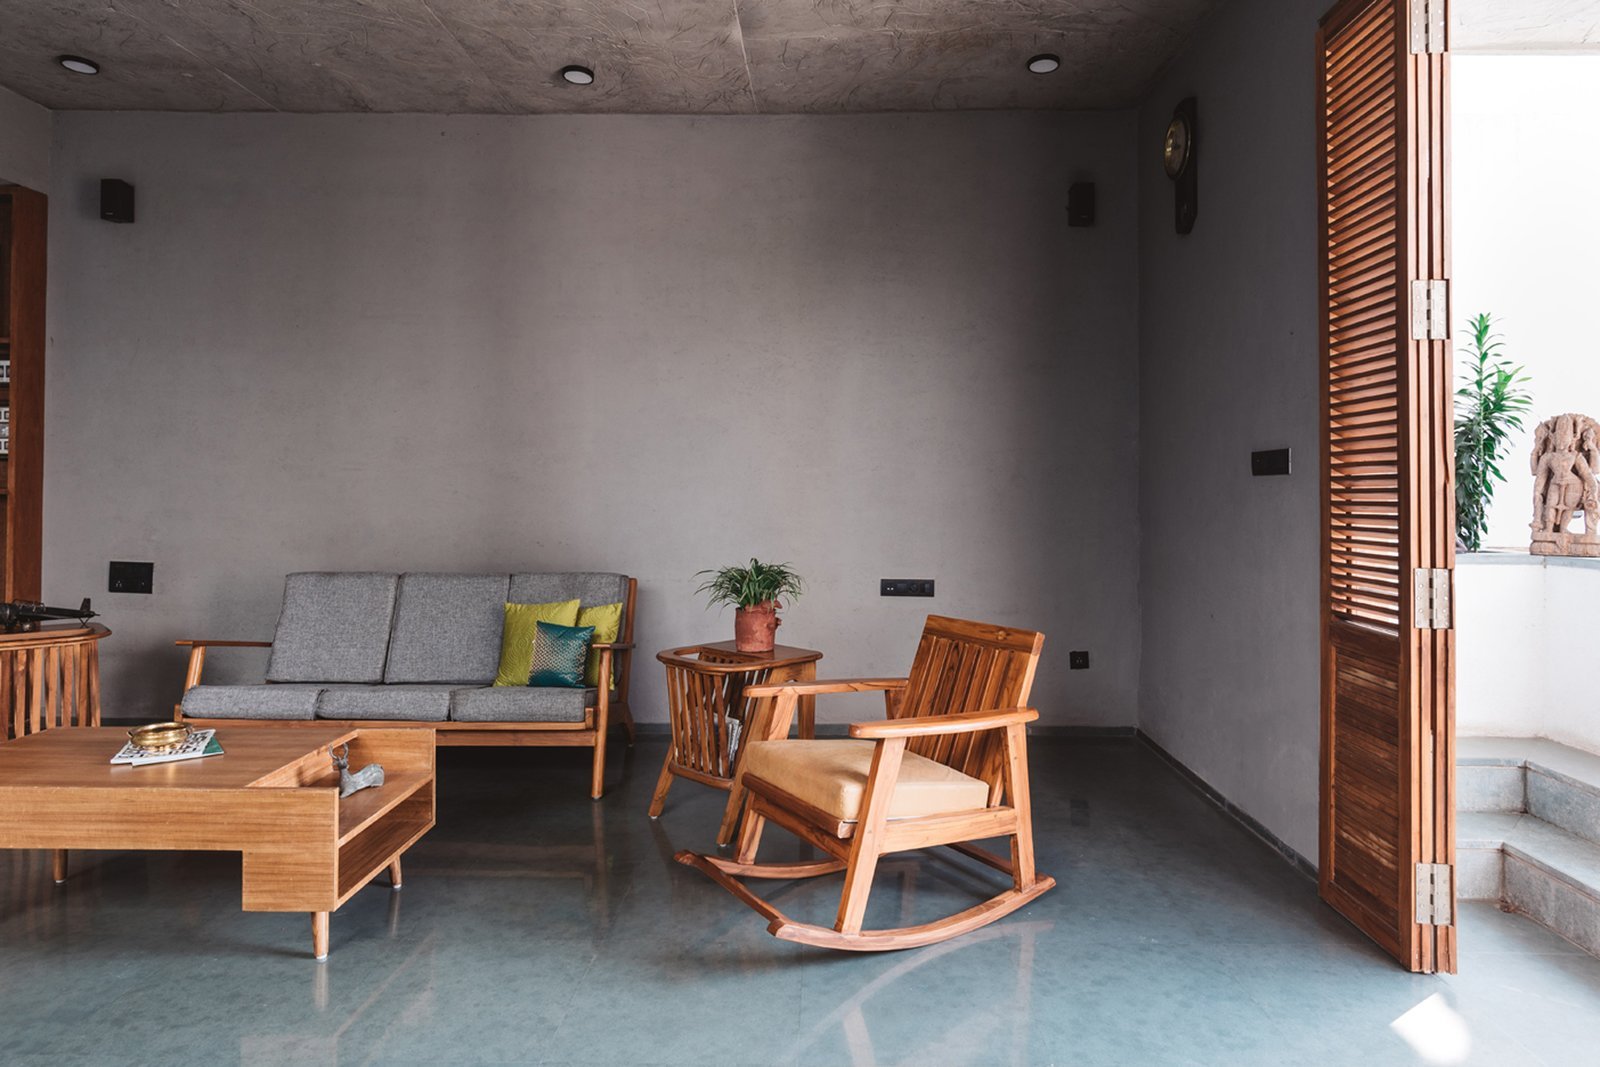 Tatanan meja dan kursi di ruang tamu minimalis tanpa adanya dekor (Sumber: dwell.com)